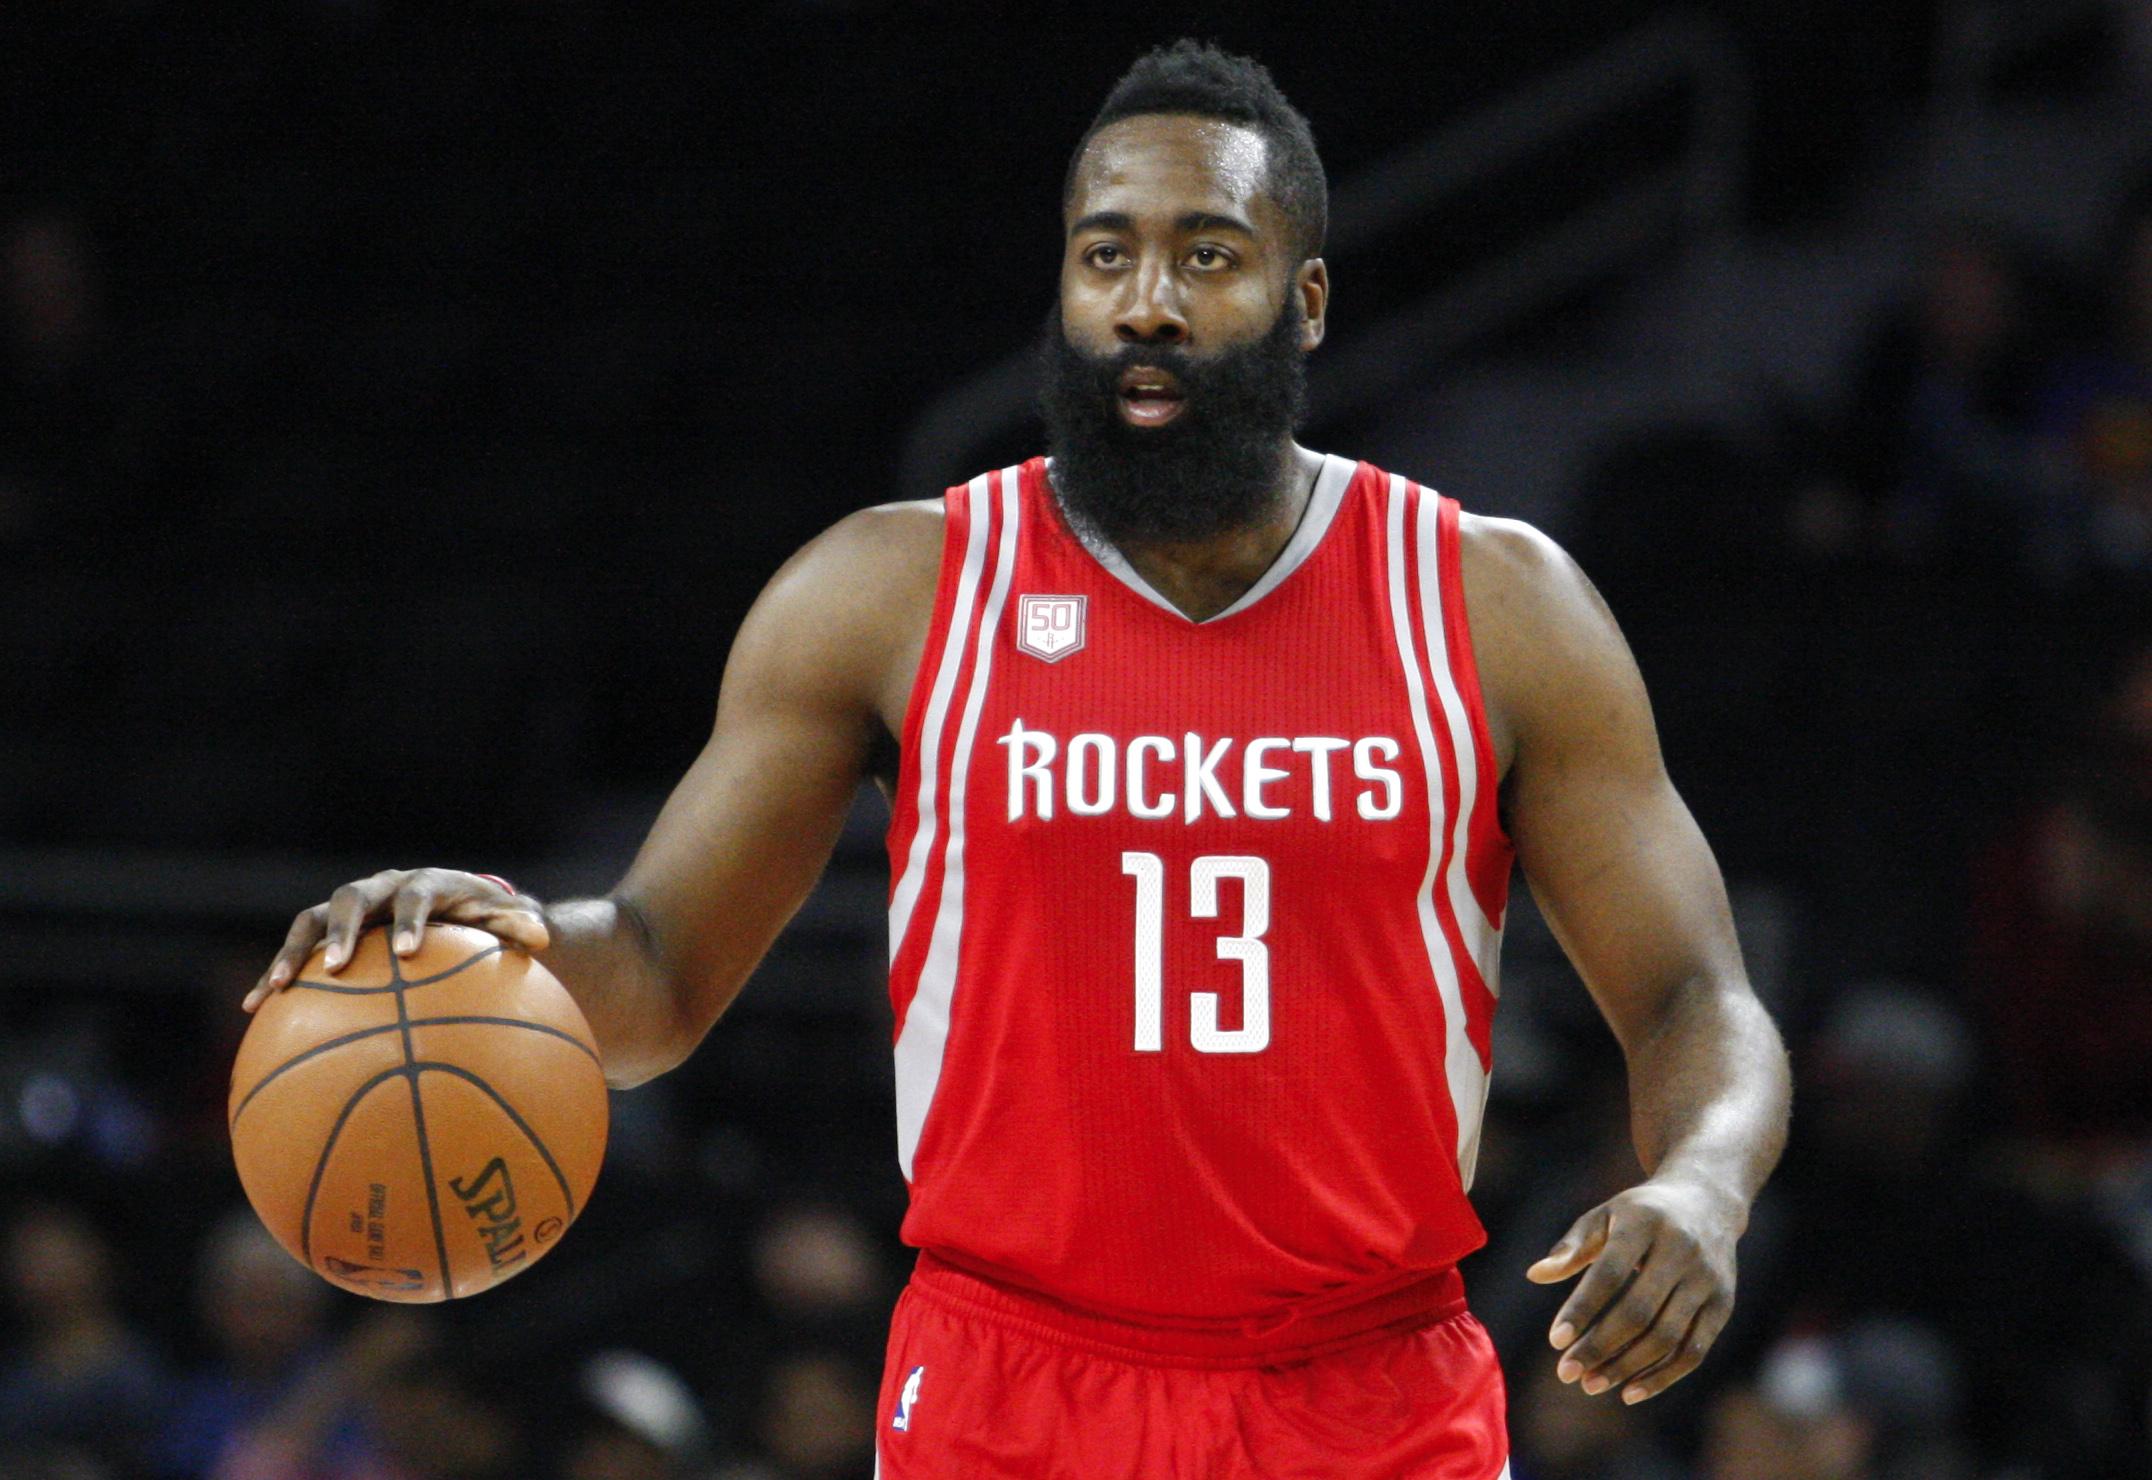 Ho houston rockets nba championship - Houston Rockets James Harden 2016 17 Season Review